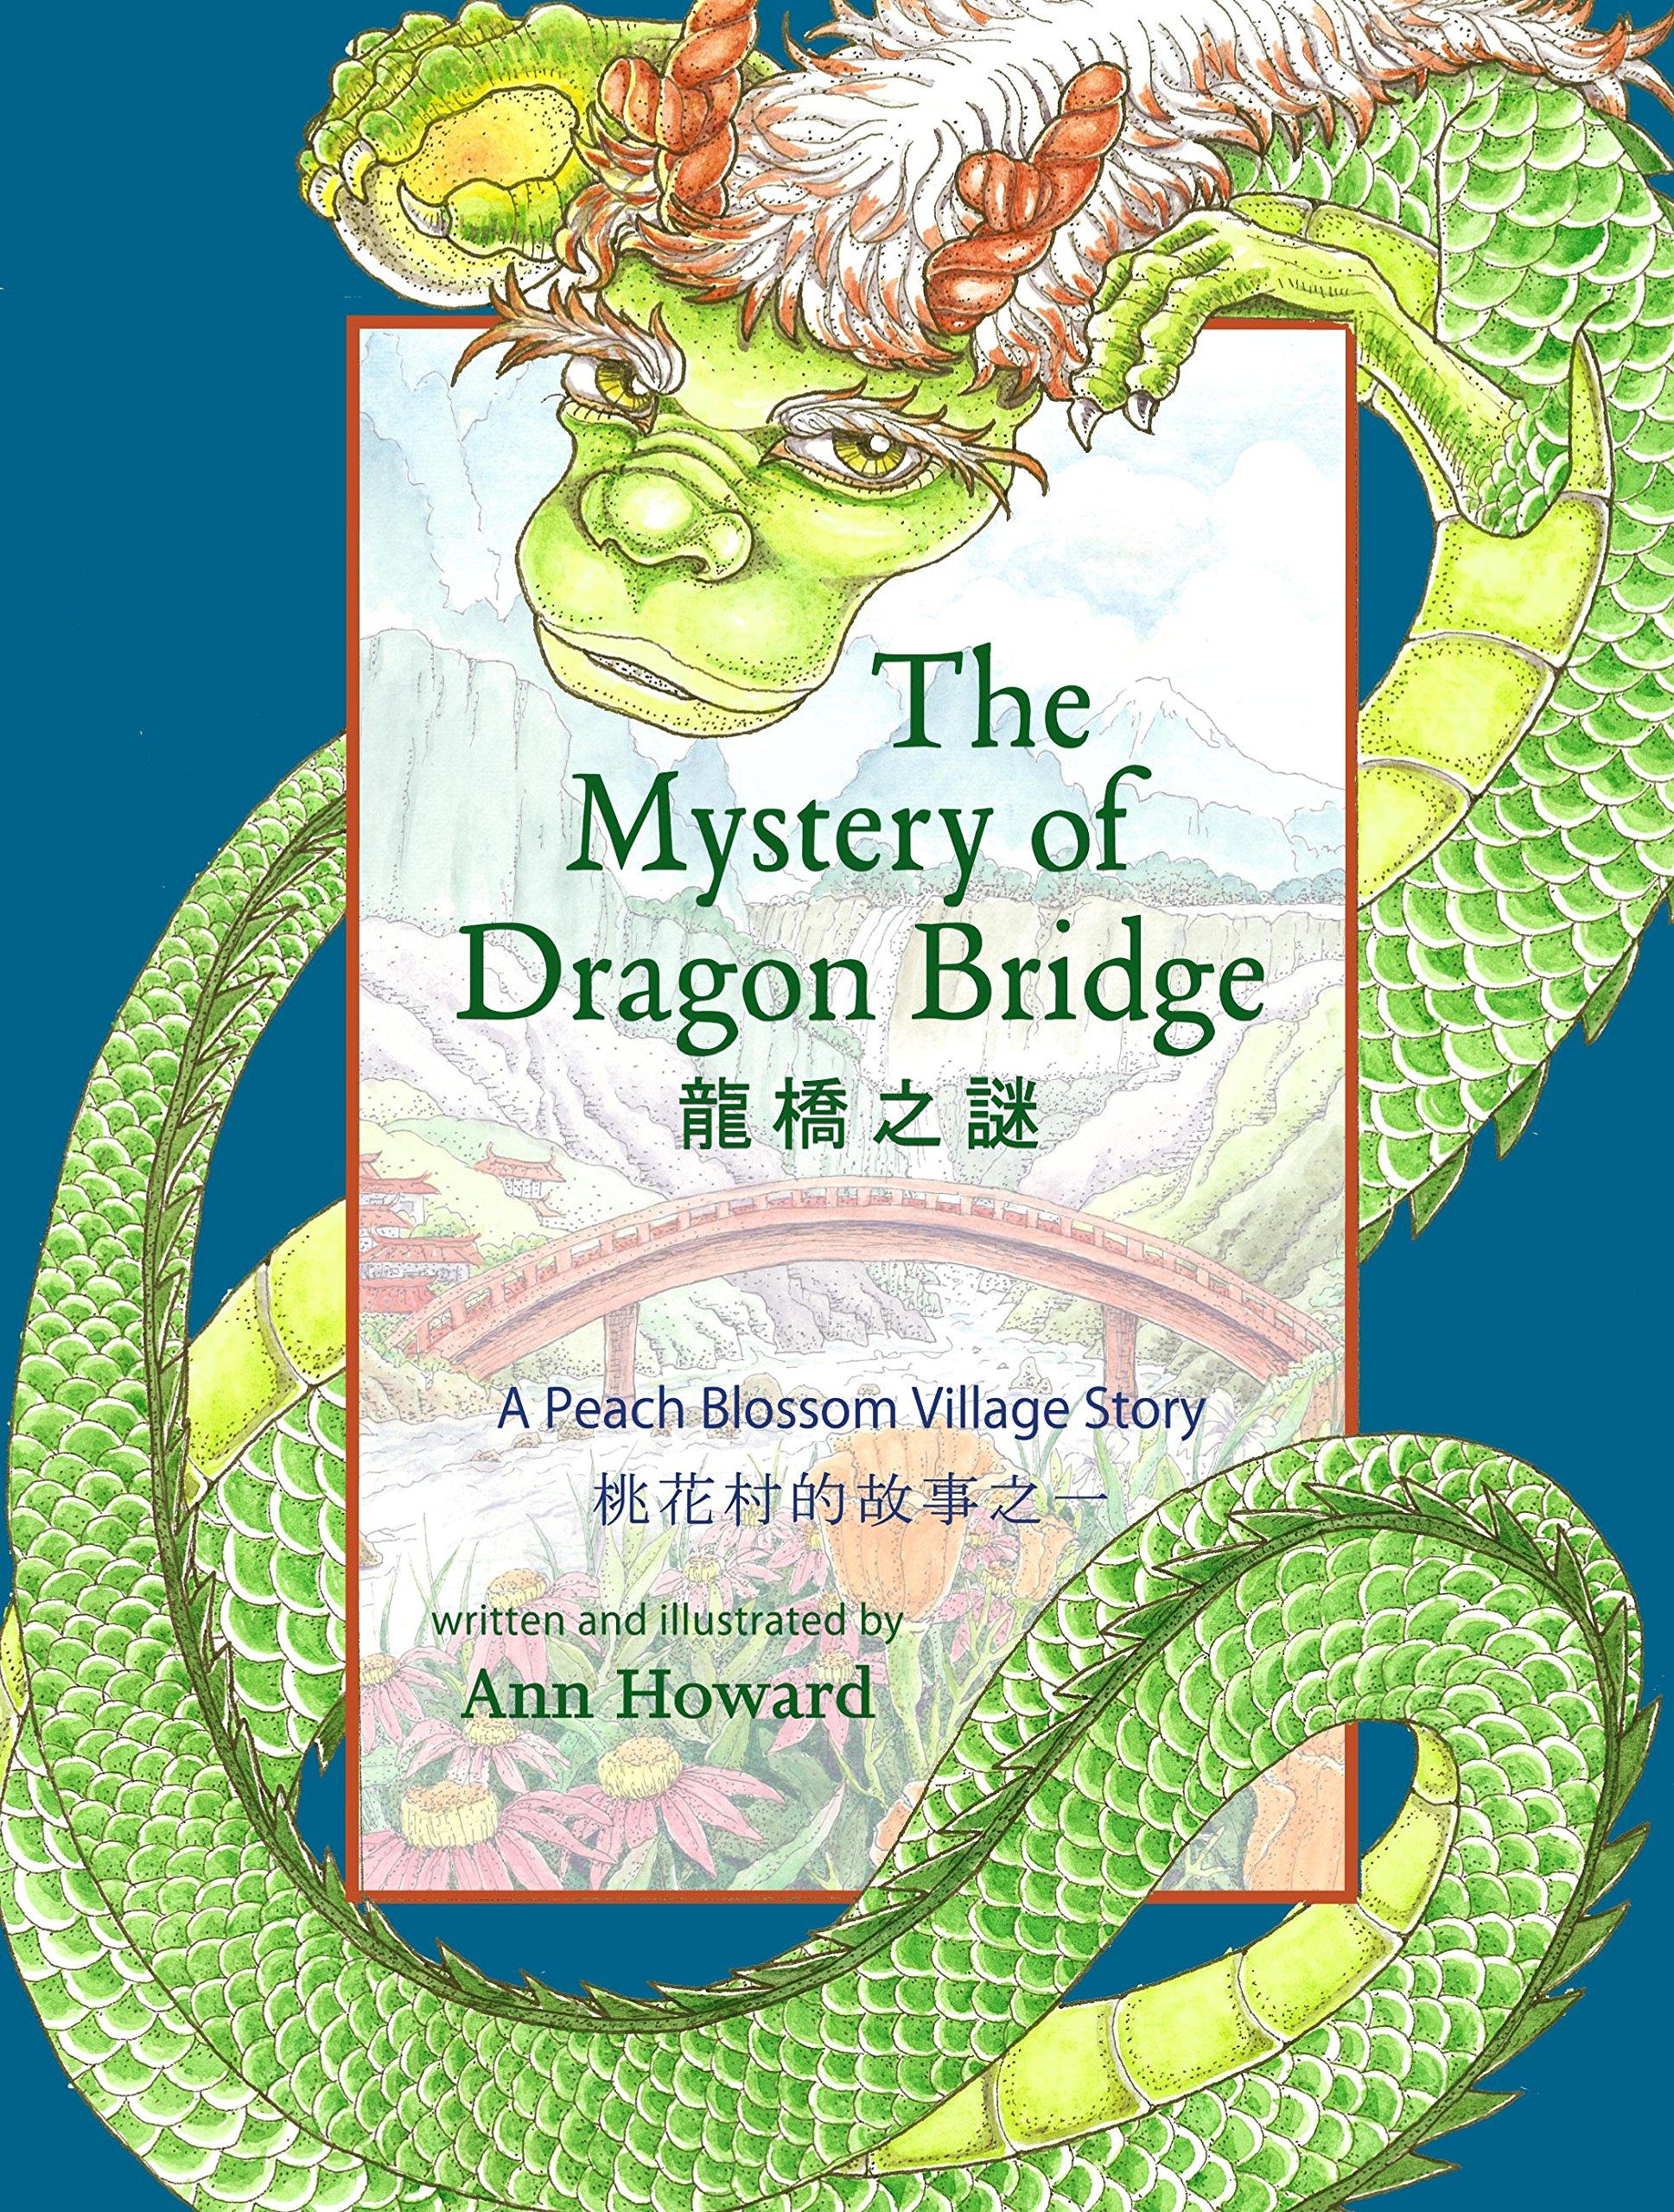 The Mystery of Dragon Bridge: A Peach Blossom Village Story